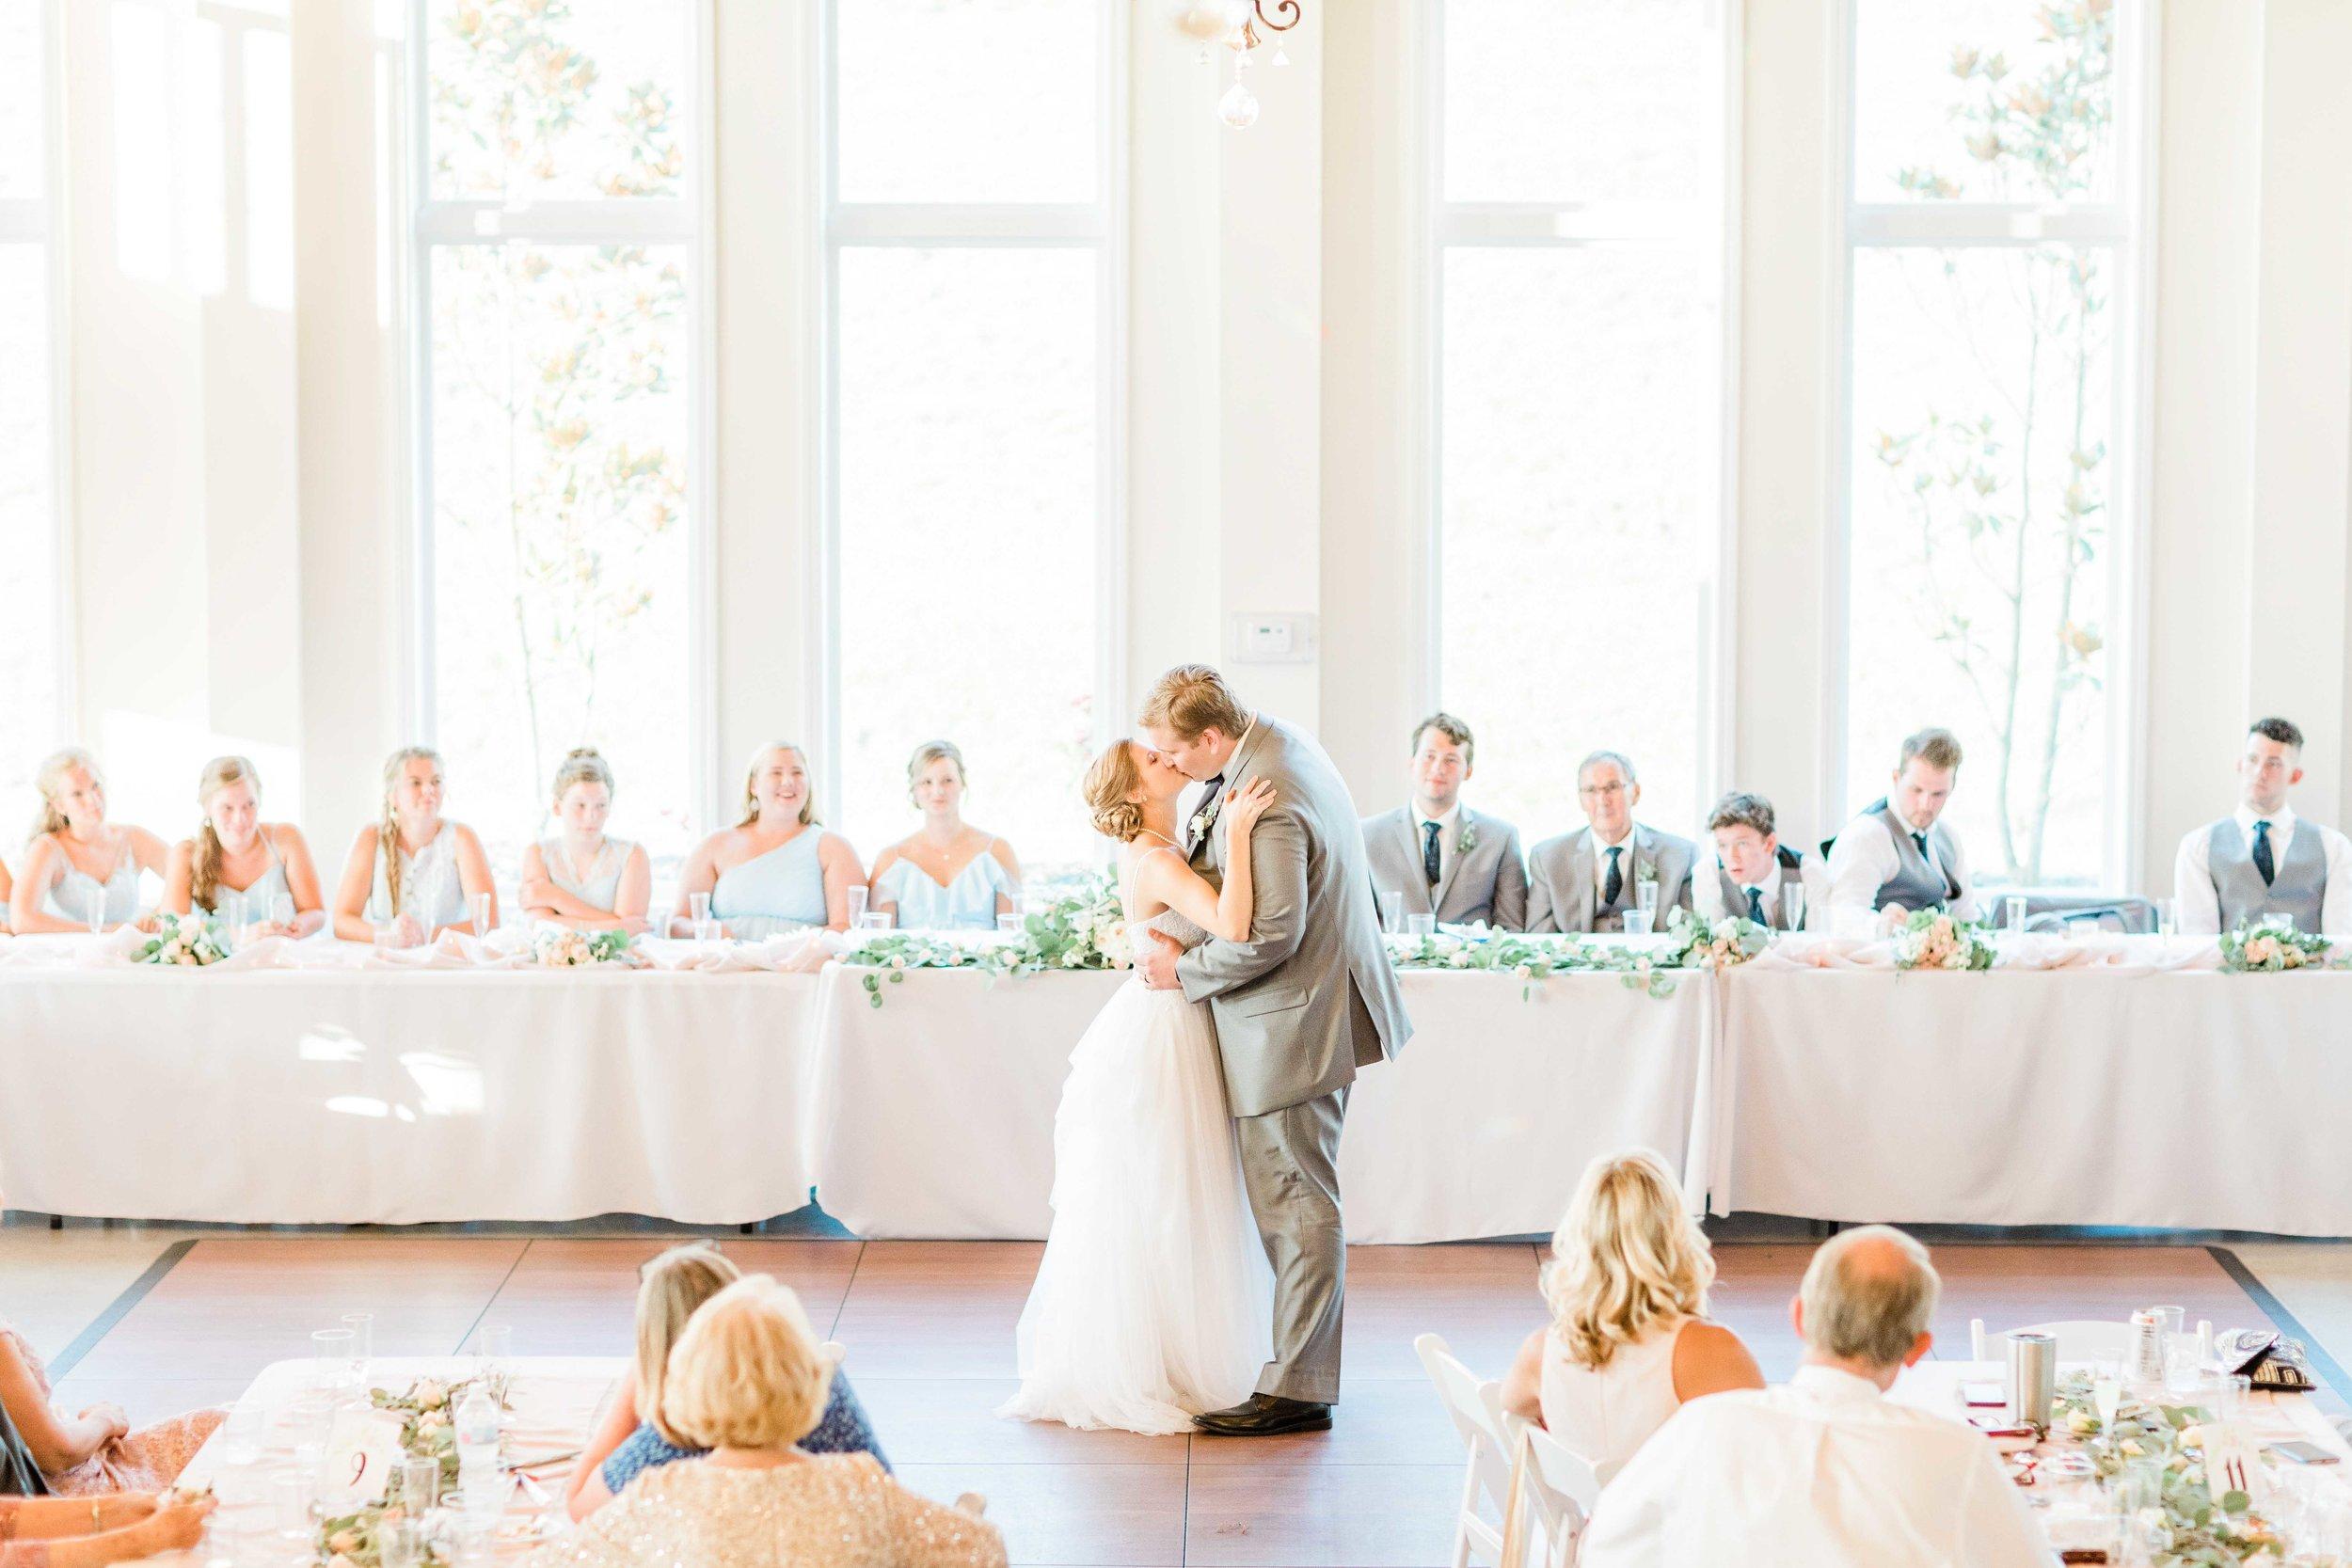 rosewood manor miamisburg wedding photos-10.jpg